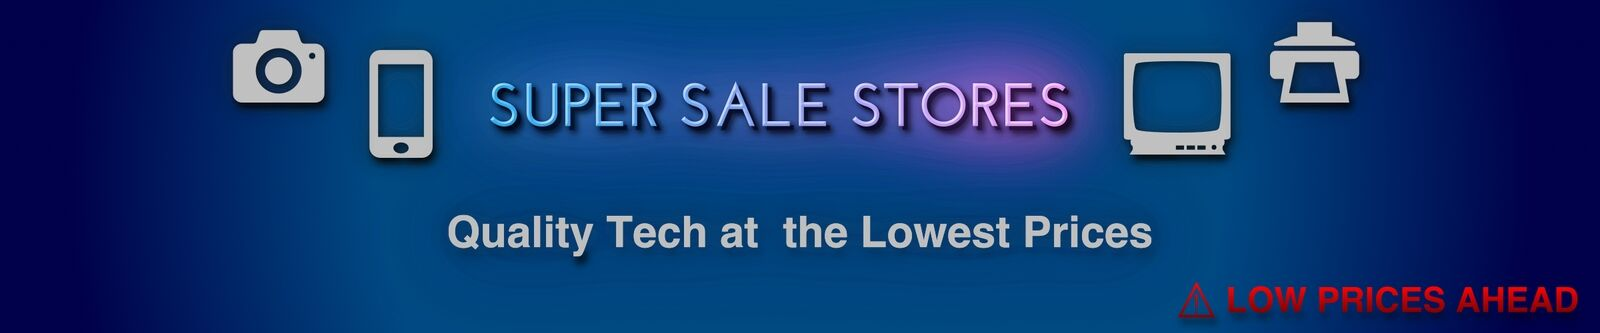 Super Sale Stores